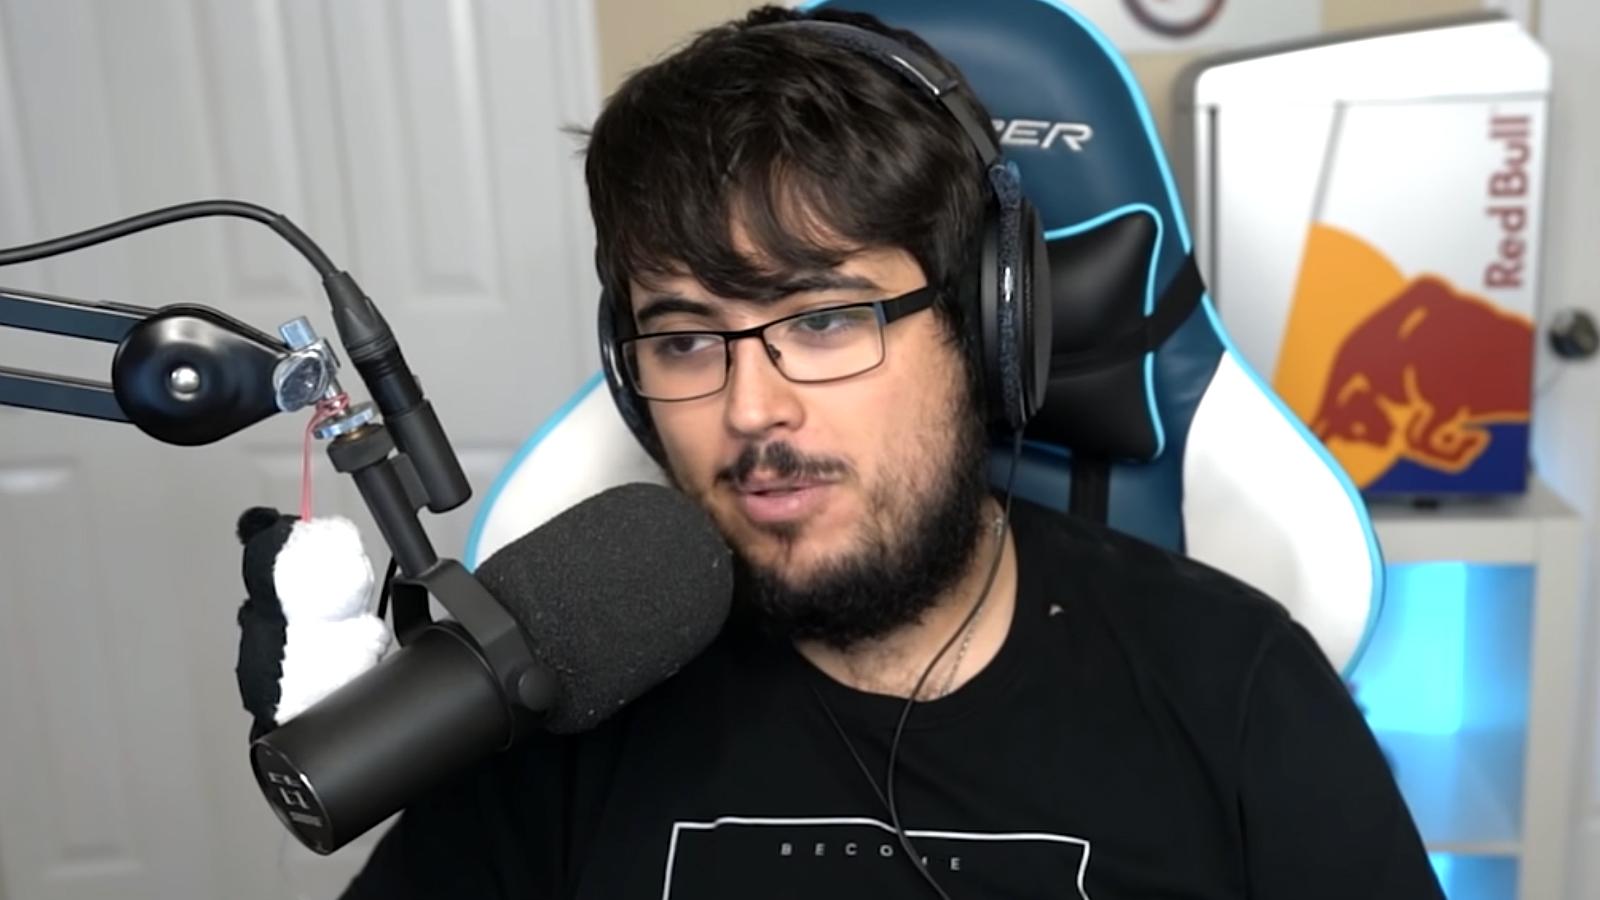 ZeRo speaking on YouTube